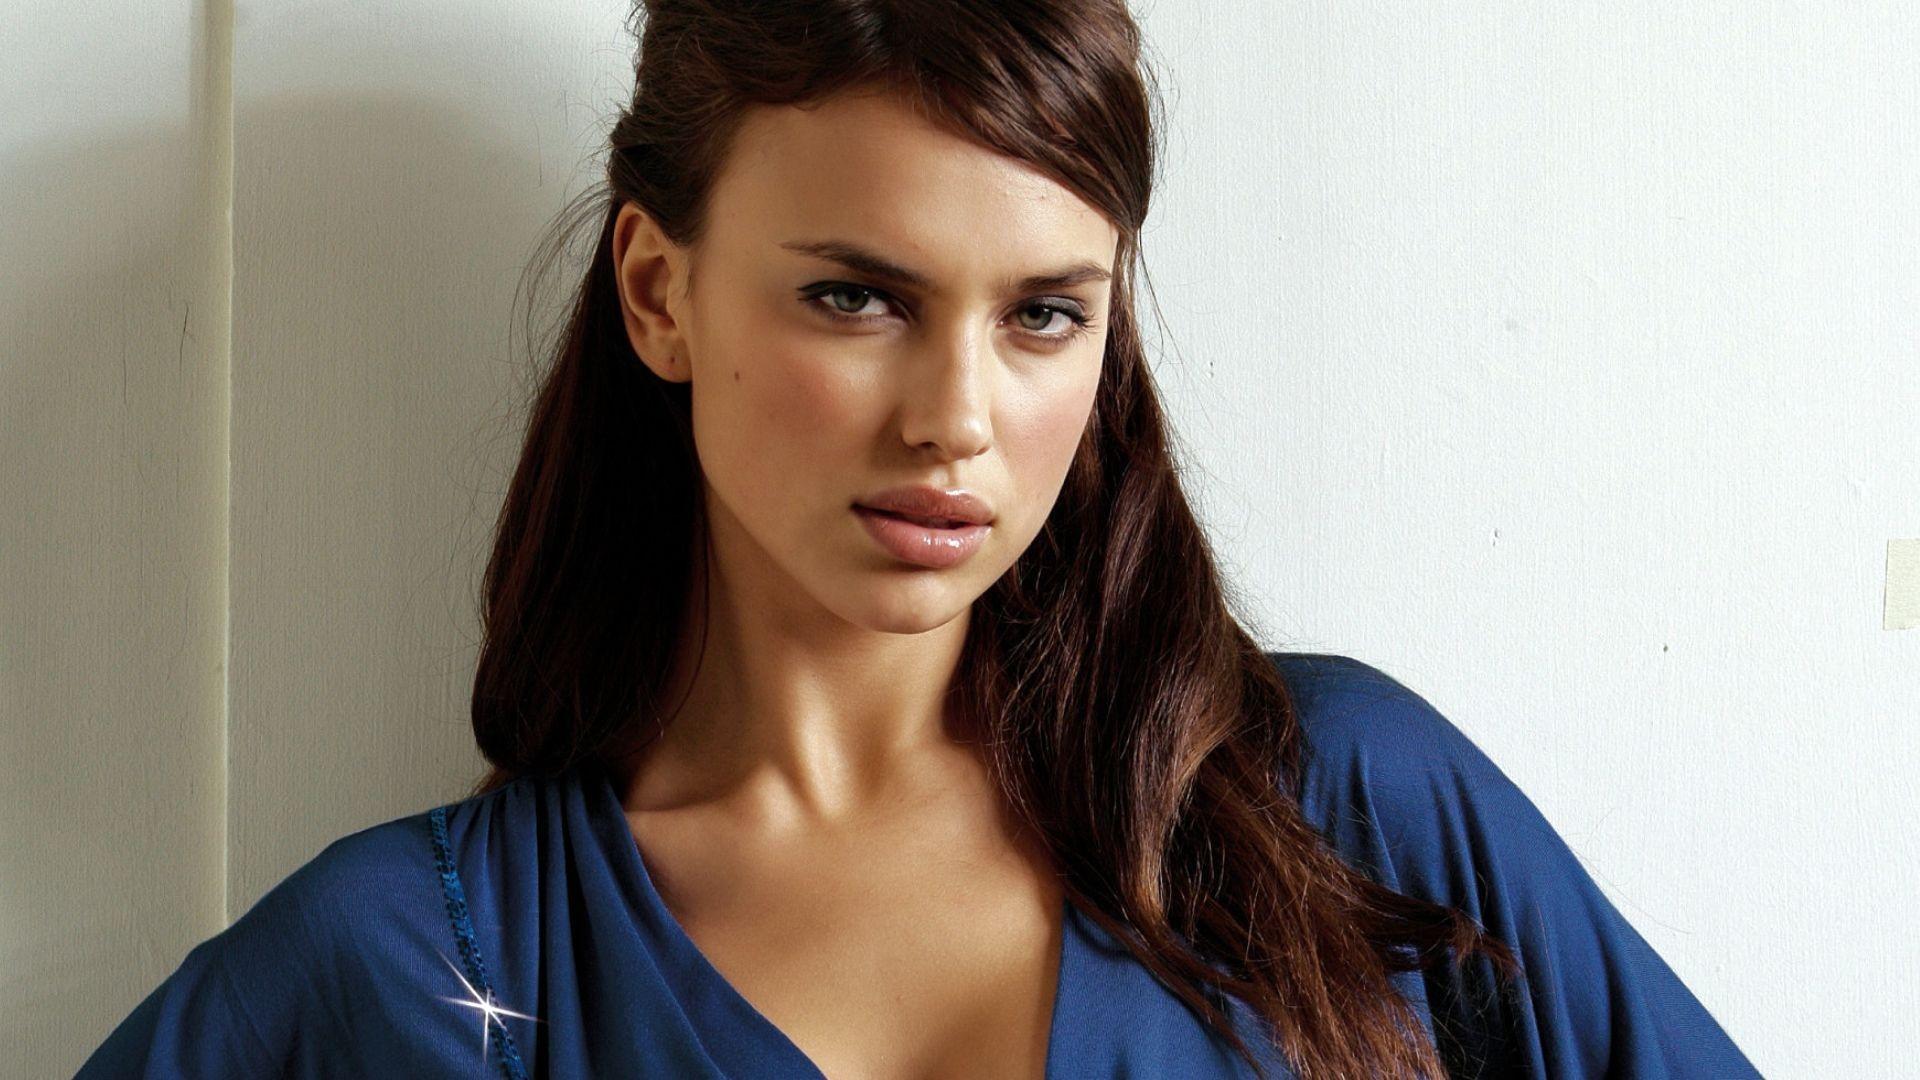 Irina Shayk Pics